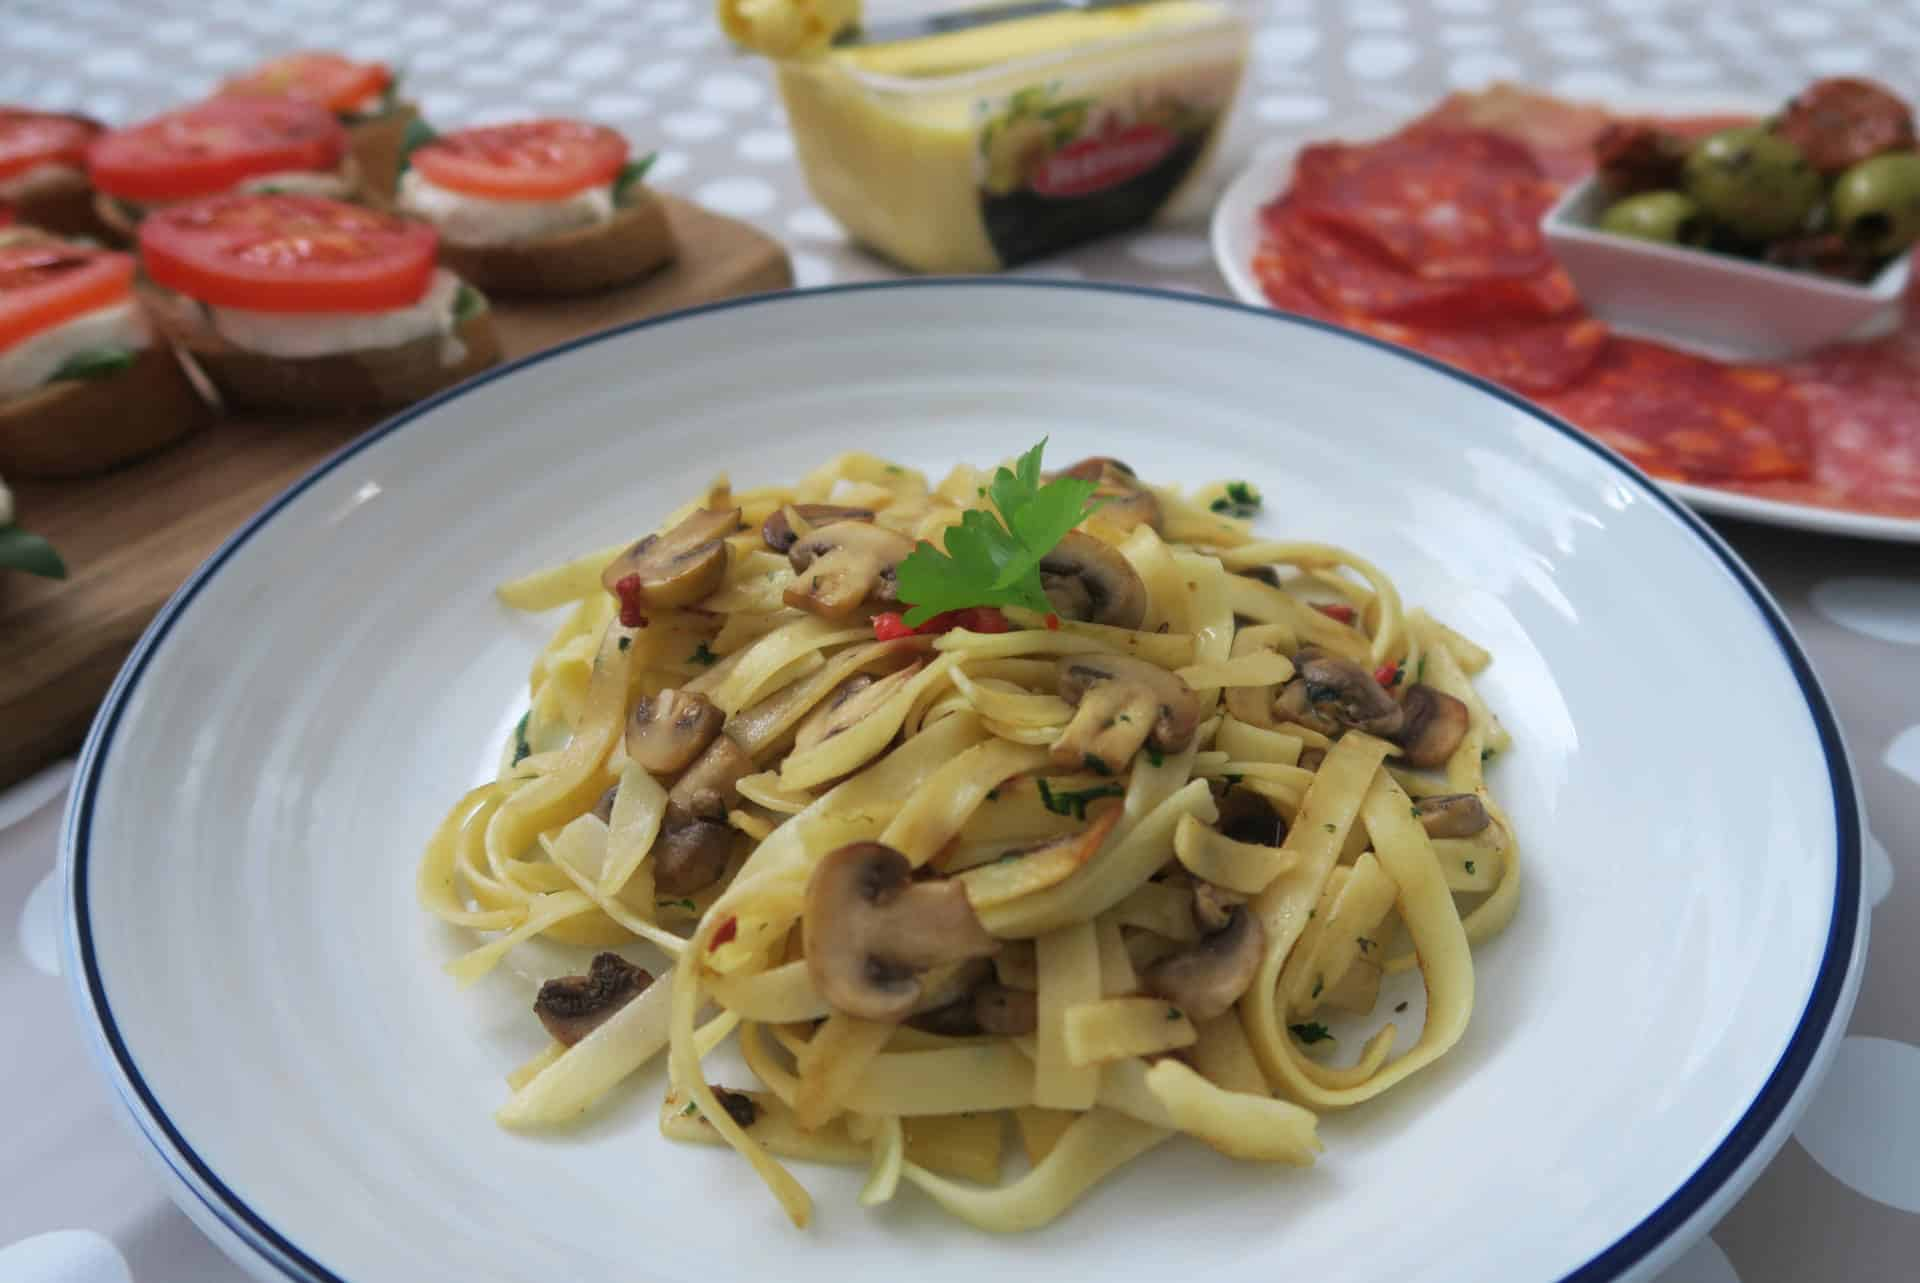 My Gluten Free Tagliatelle with Garlic Mushrooms Recipe (vegan, low FODMAP)